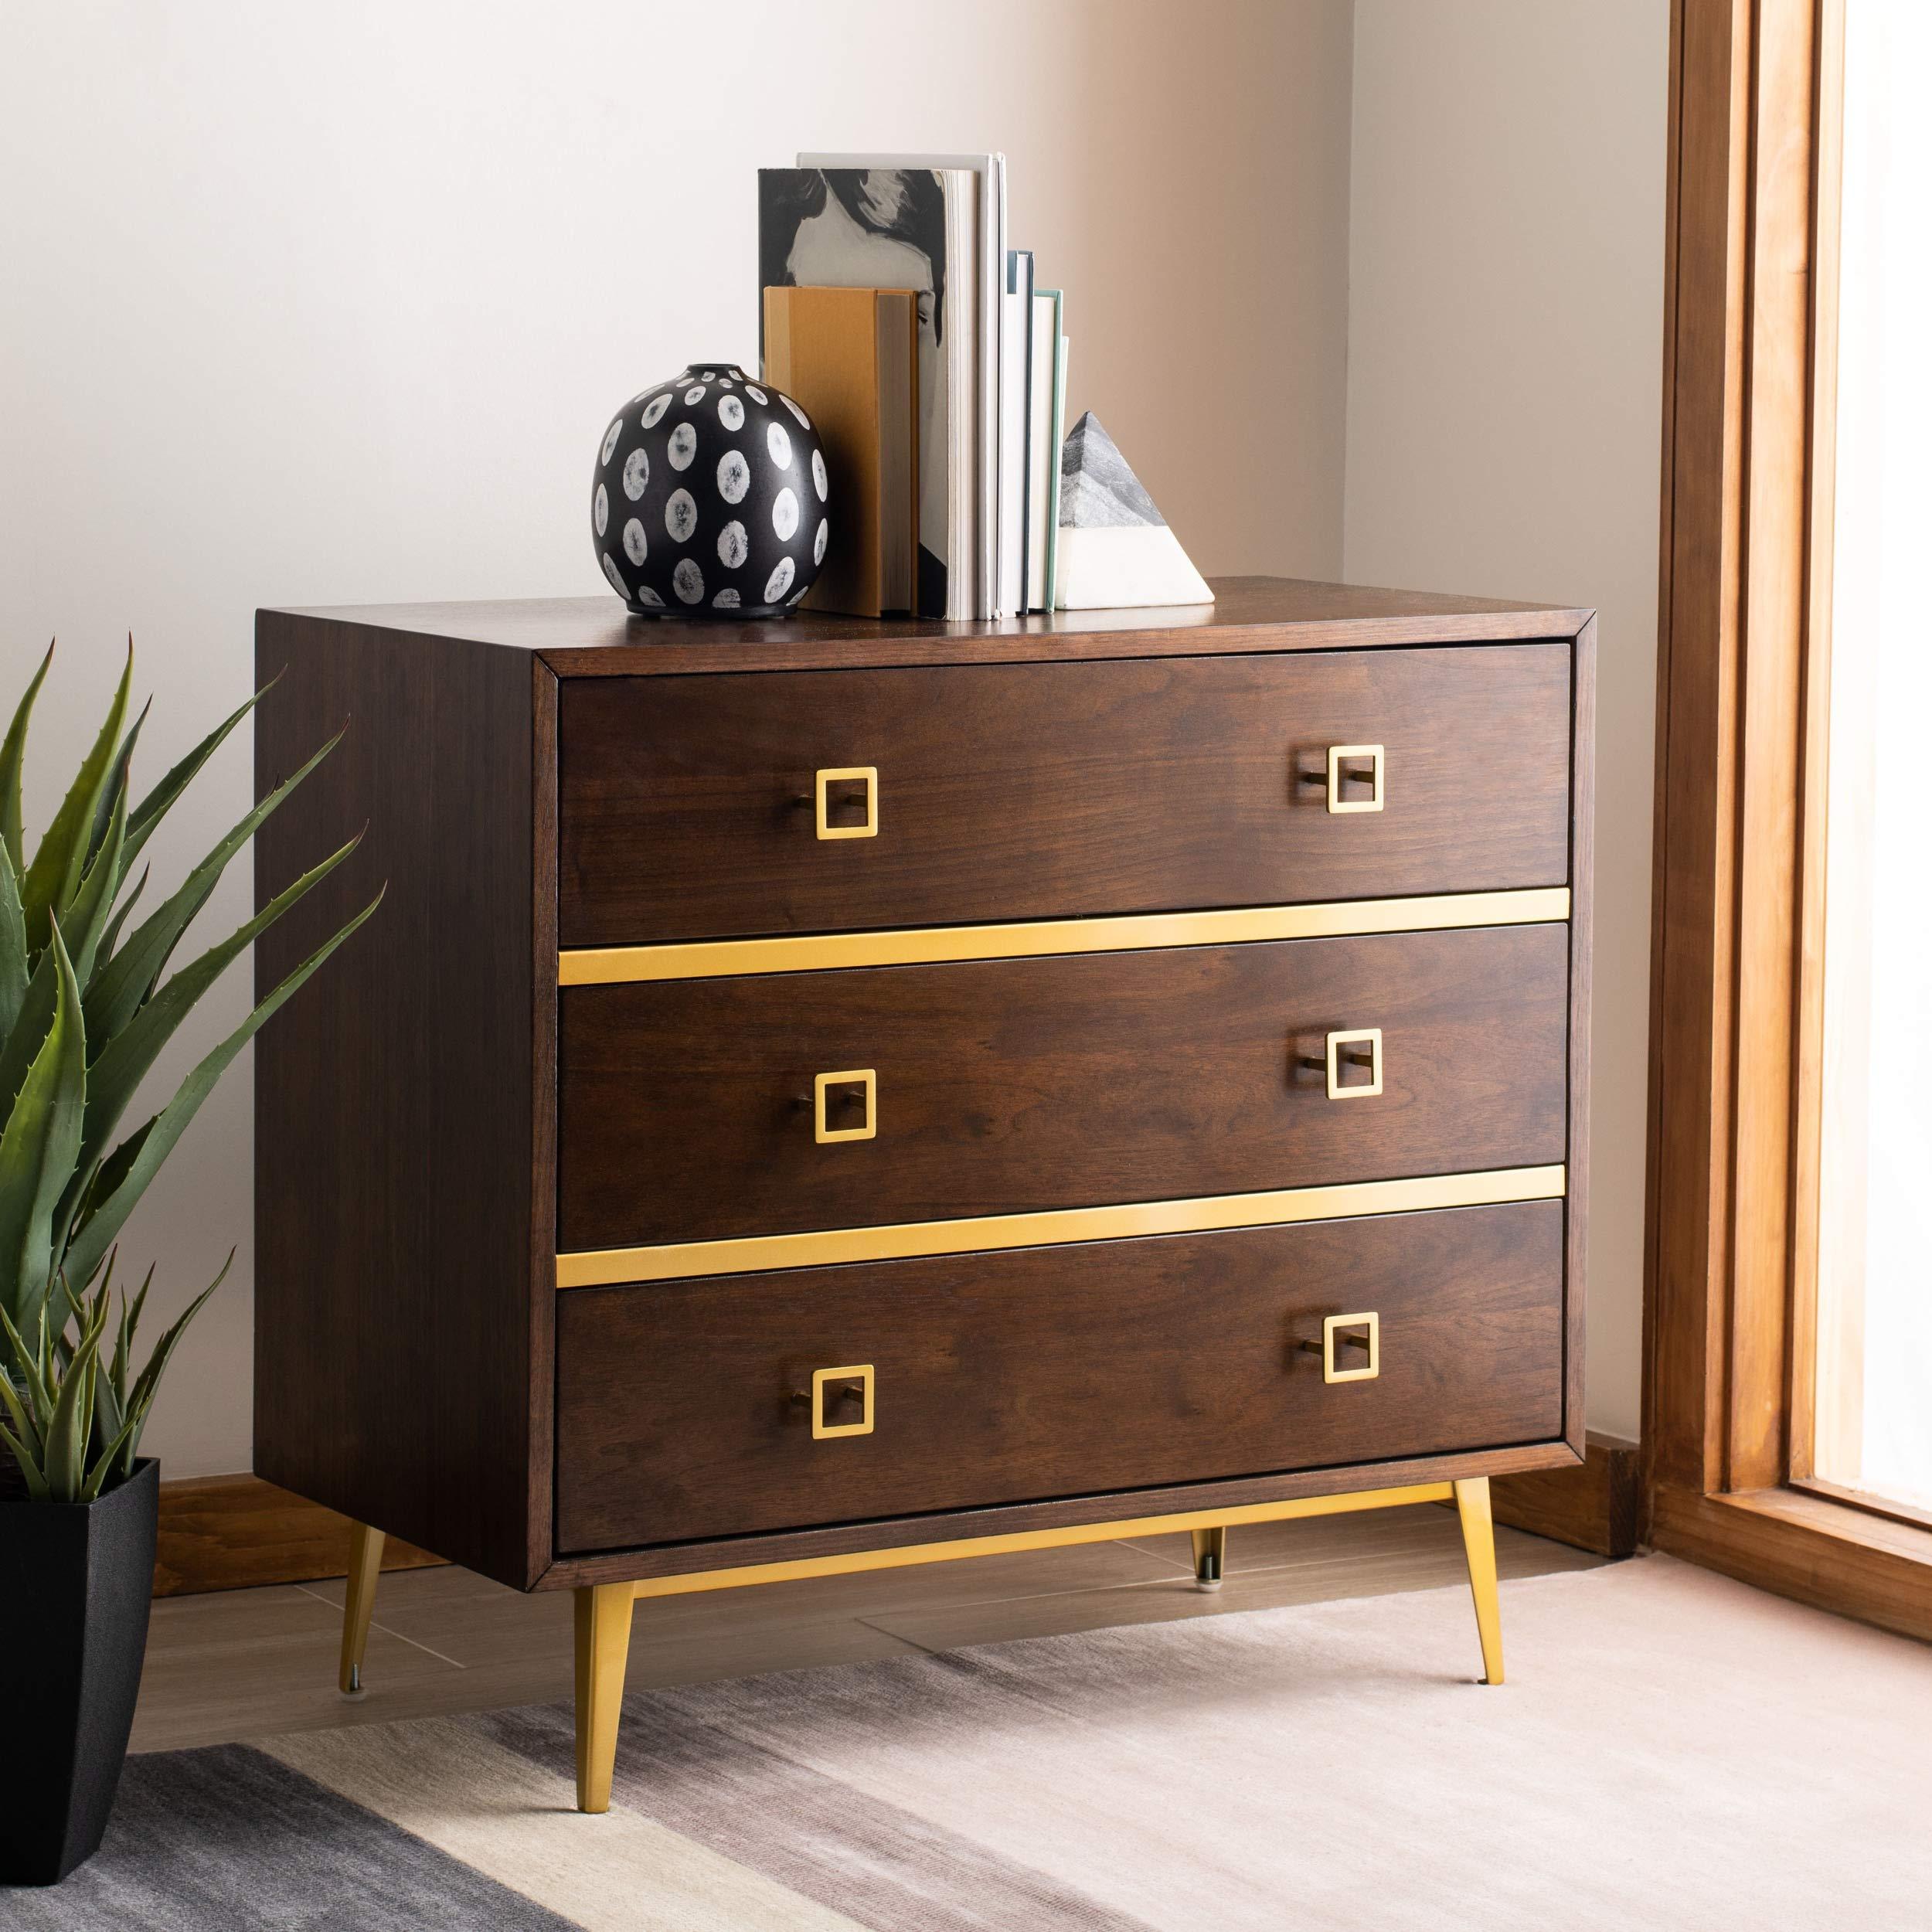 Safavieh Home Mid-Century Modern Katia Walnut and Gold 3-Drawer Chest, 31.9'' x 16'' x 29'', Brown by Safavieh